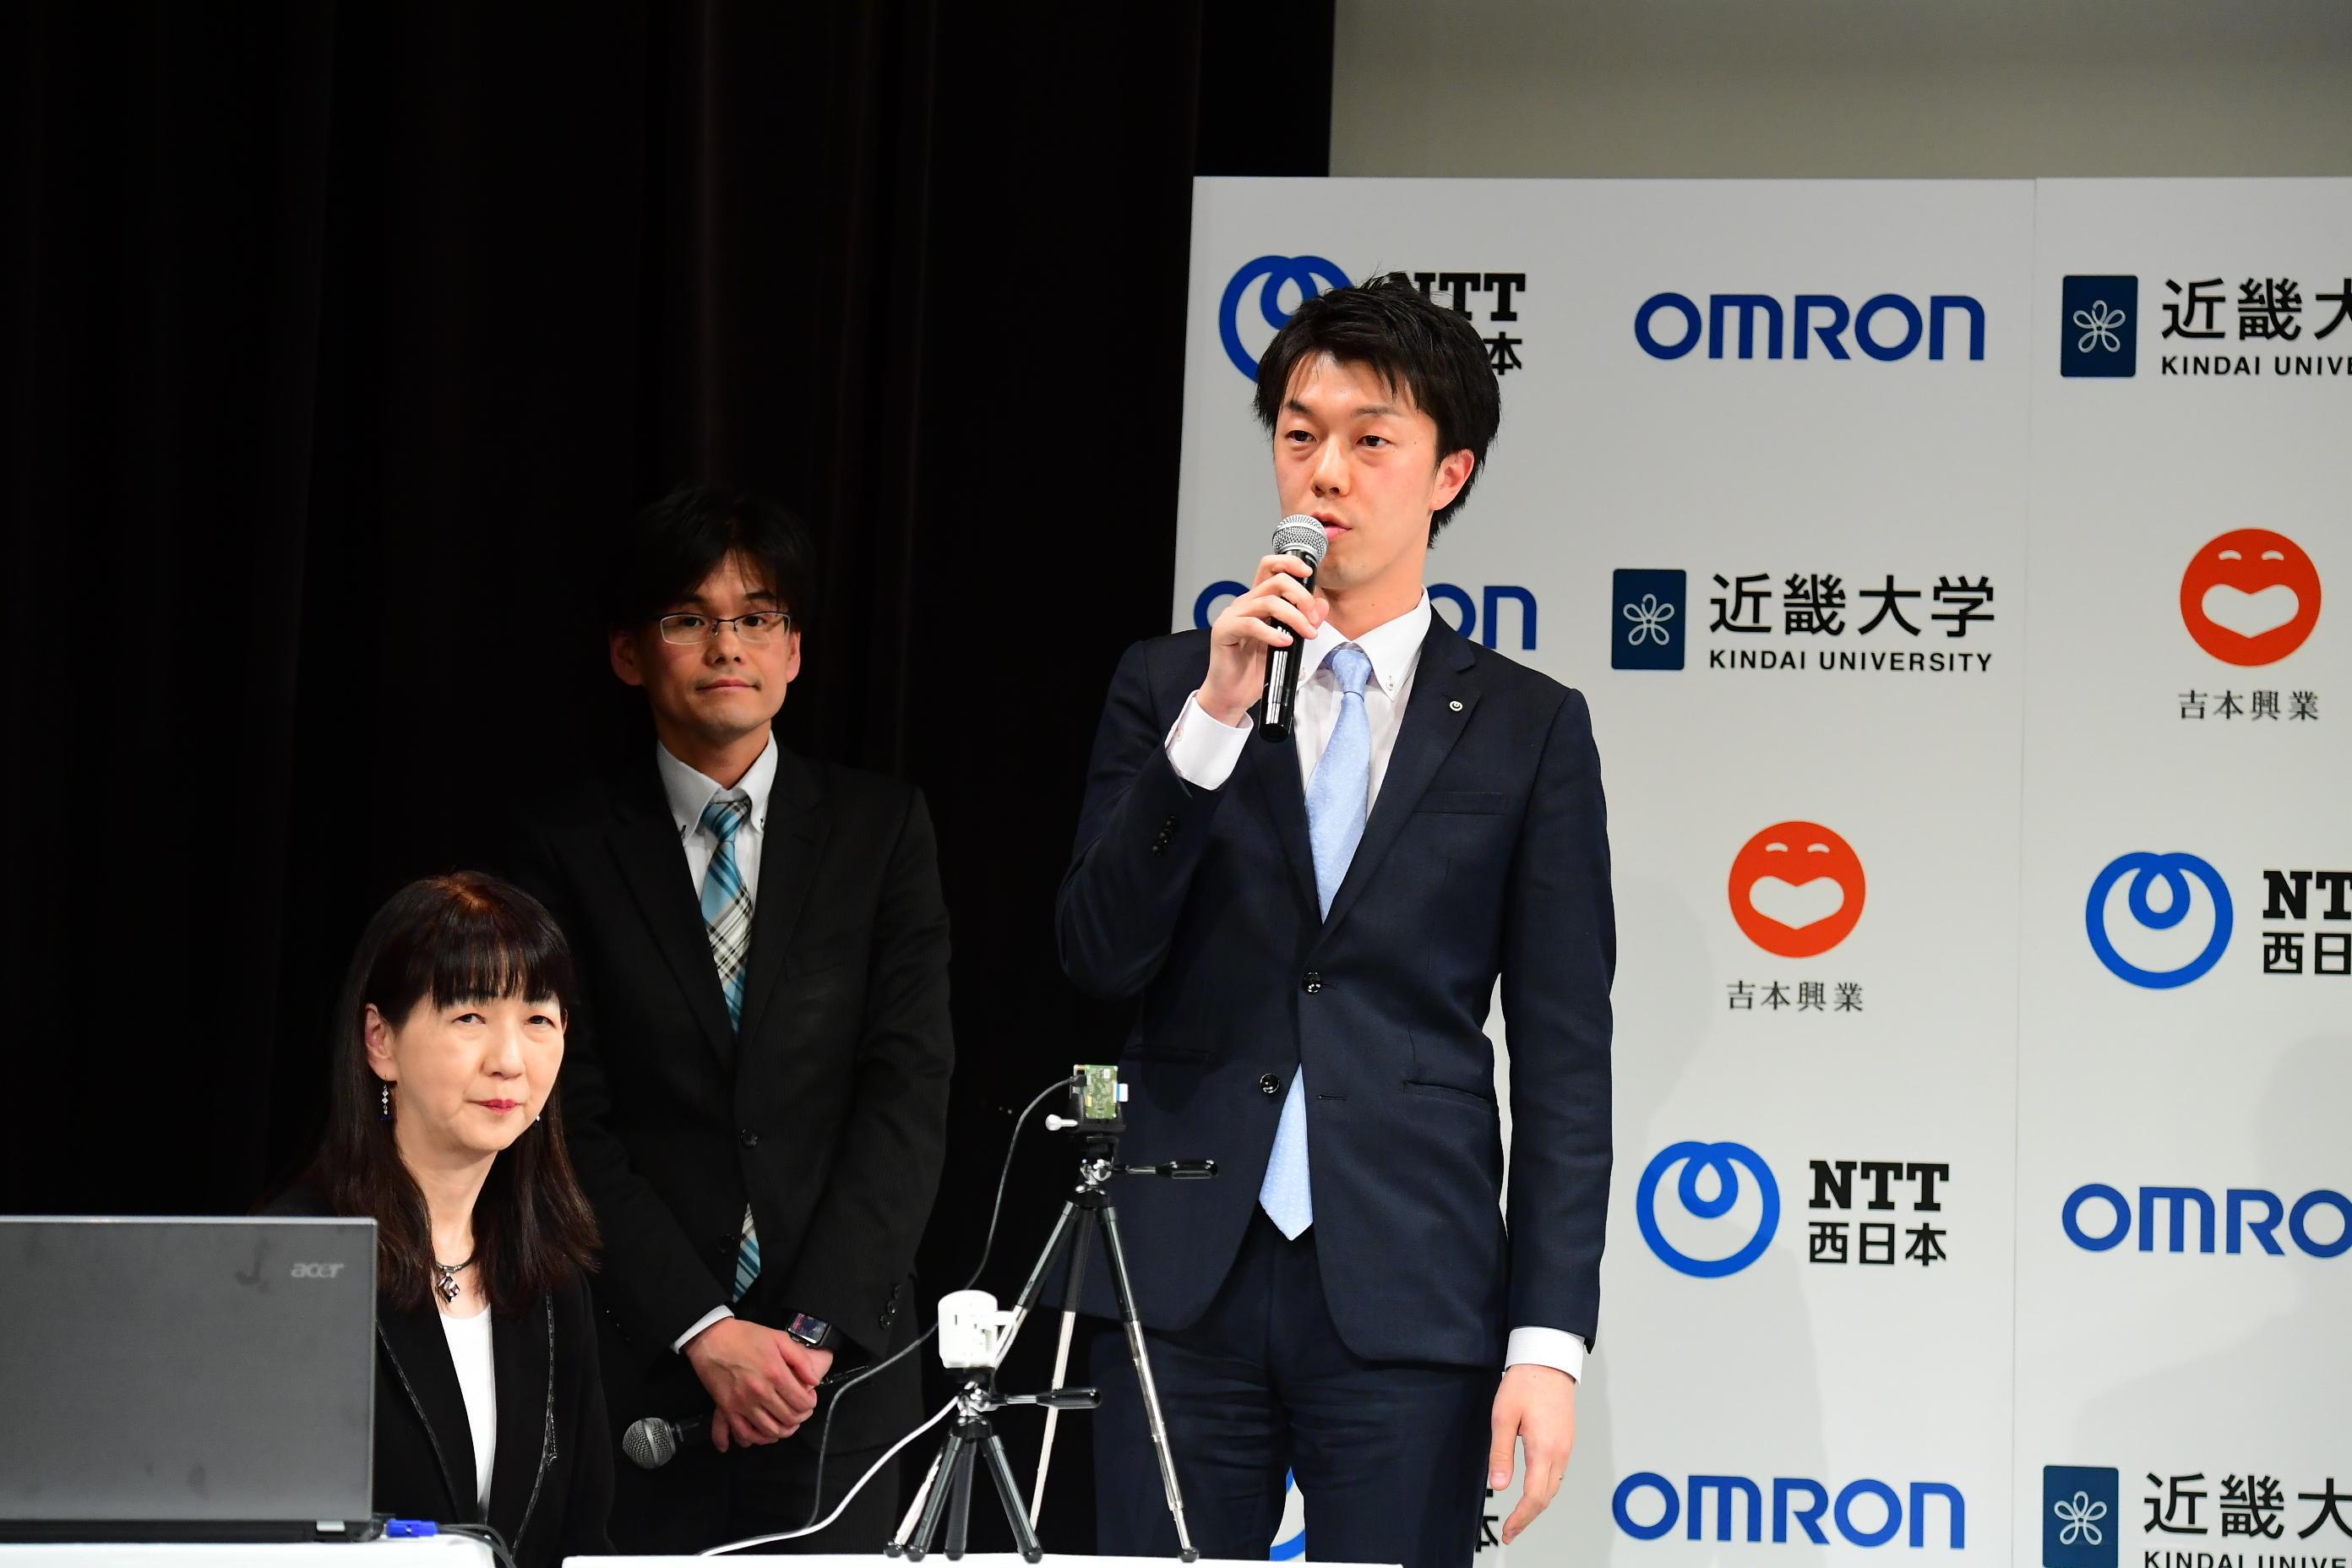 http://news.yoshimoto.co.jp/20170215202421-43b10eae2e246c43a20bfb038ee010512697cfae.jpg